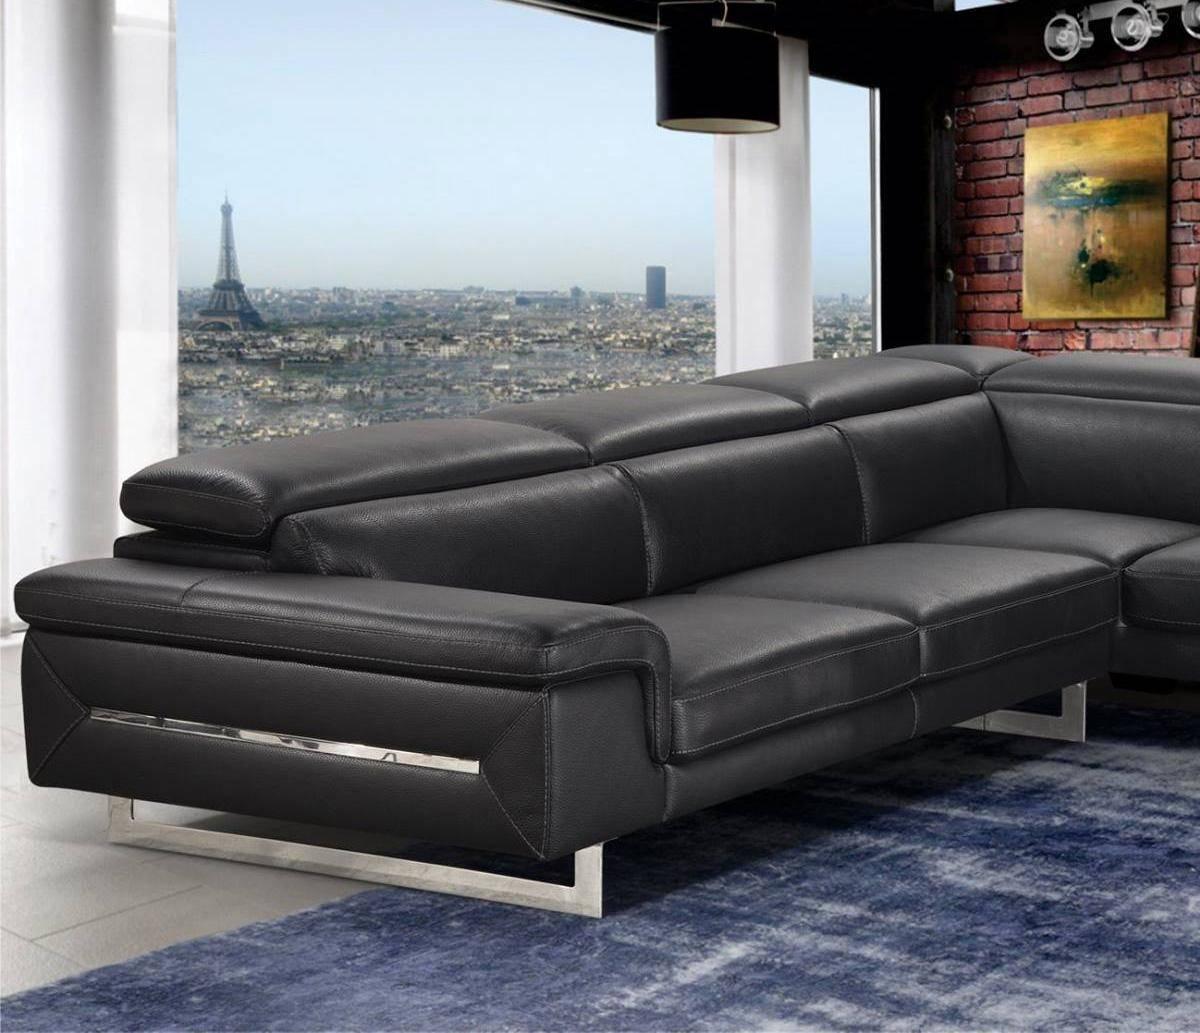 vig accenti italia lazio sectional sofa left hand chase in black italian leather